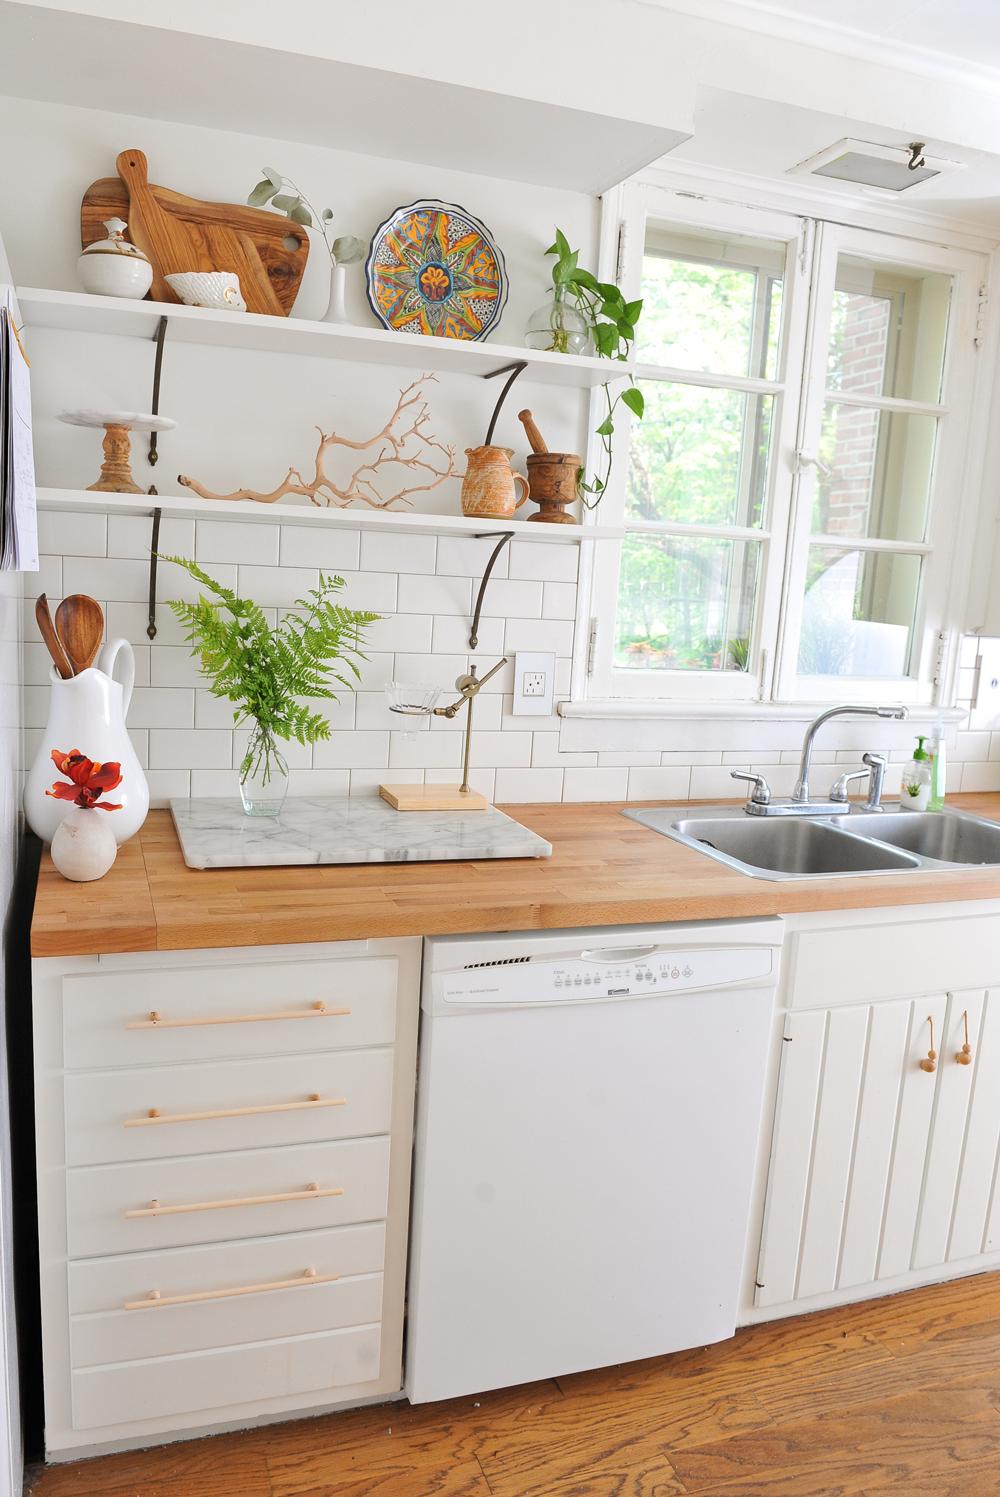 DIY Modern Wood Cabinet Pulls   A New Bloom Kitchen